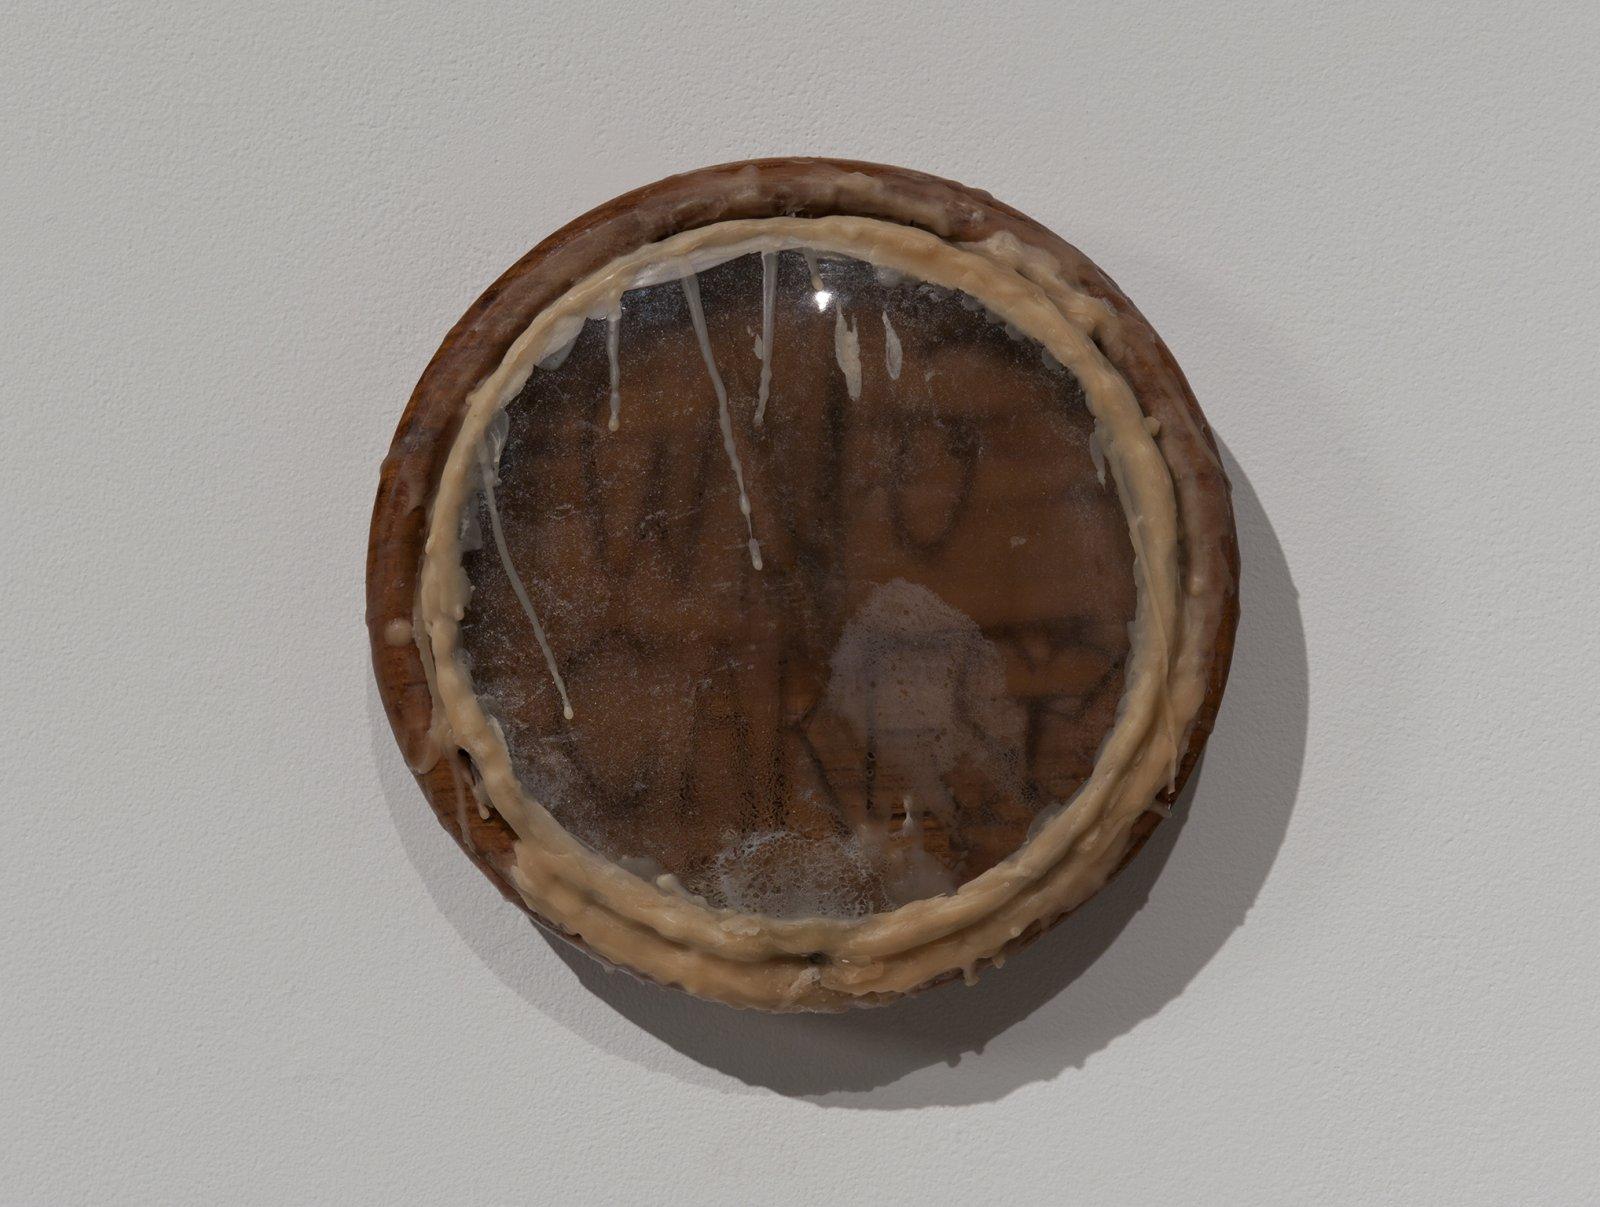 Julia Feyrer, Sauna Clock Diffuser, 2012, wood clock body, condensation, convex glass, wood clock hands, thyme oil, quartz clock movement, 10 diameter x 3 in. (26 diameter x 7 cm) by Julia Feyrer